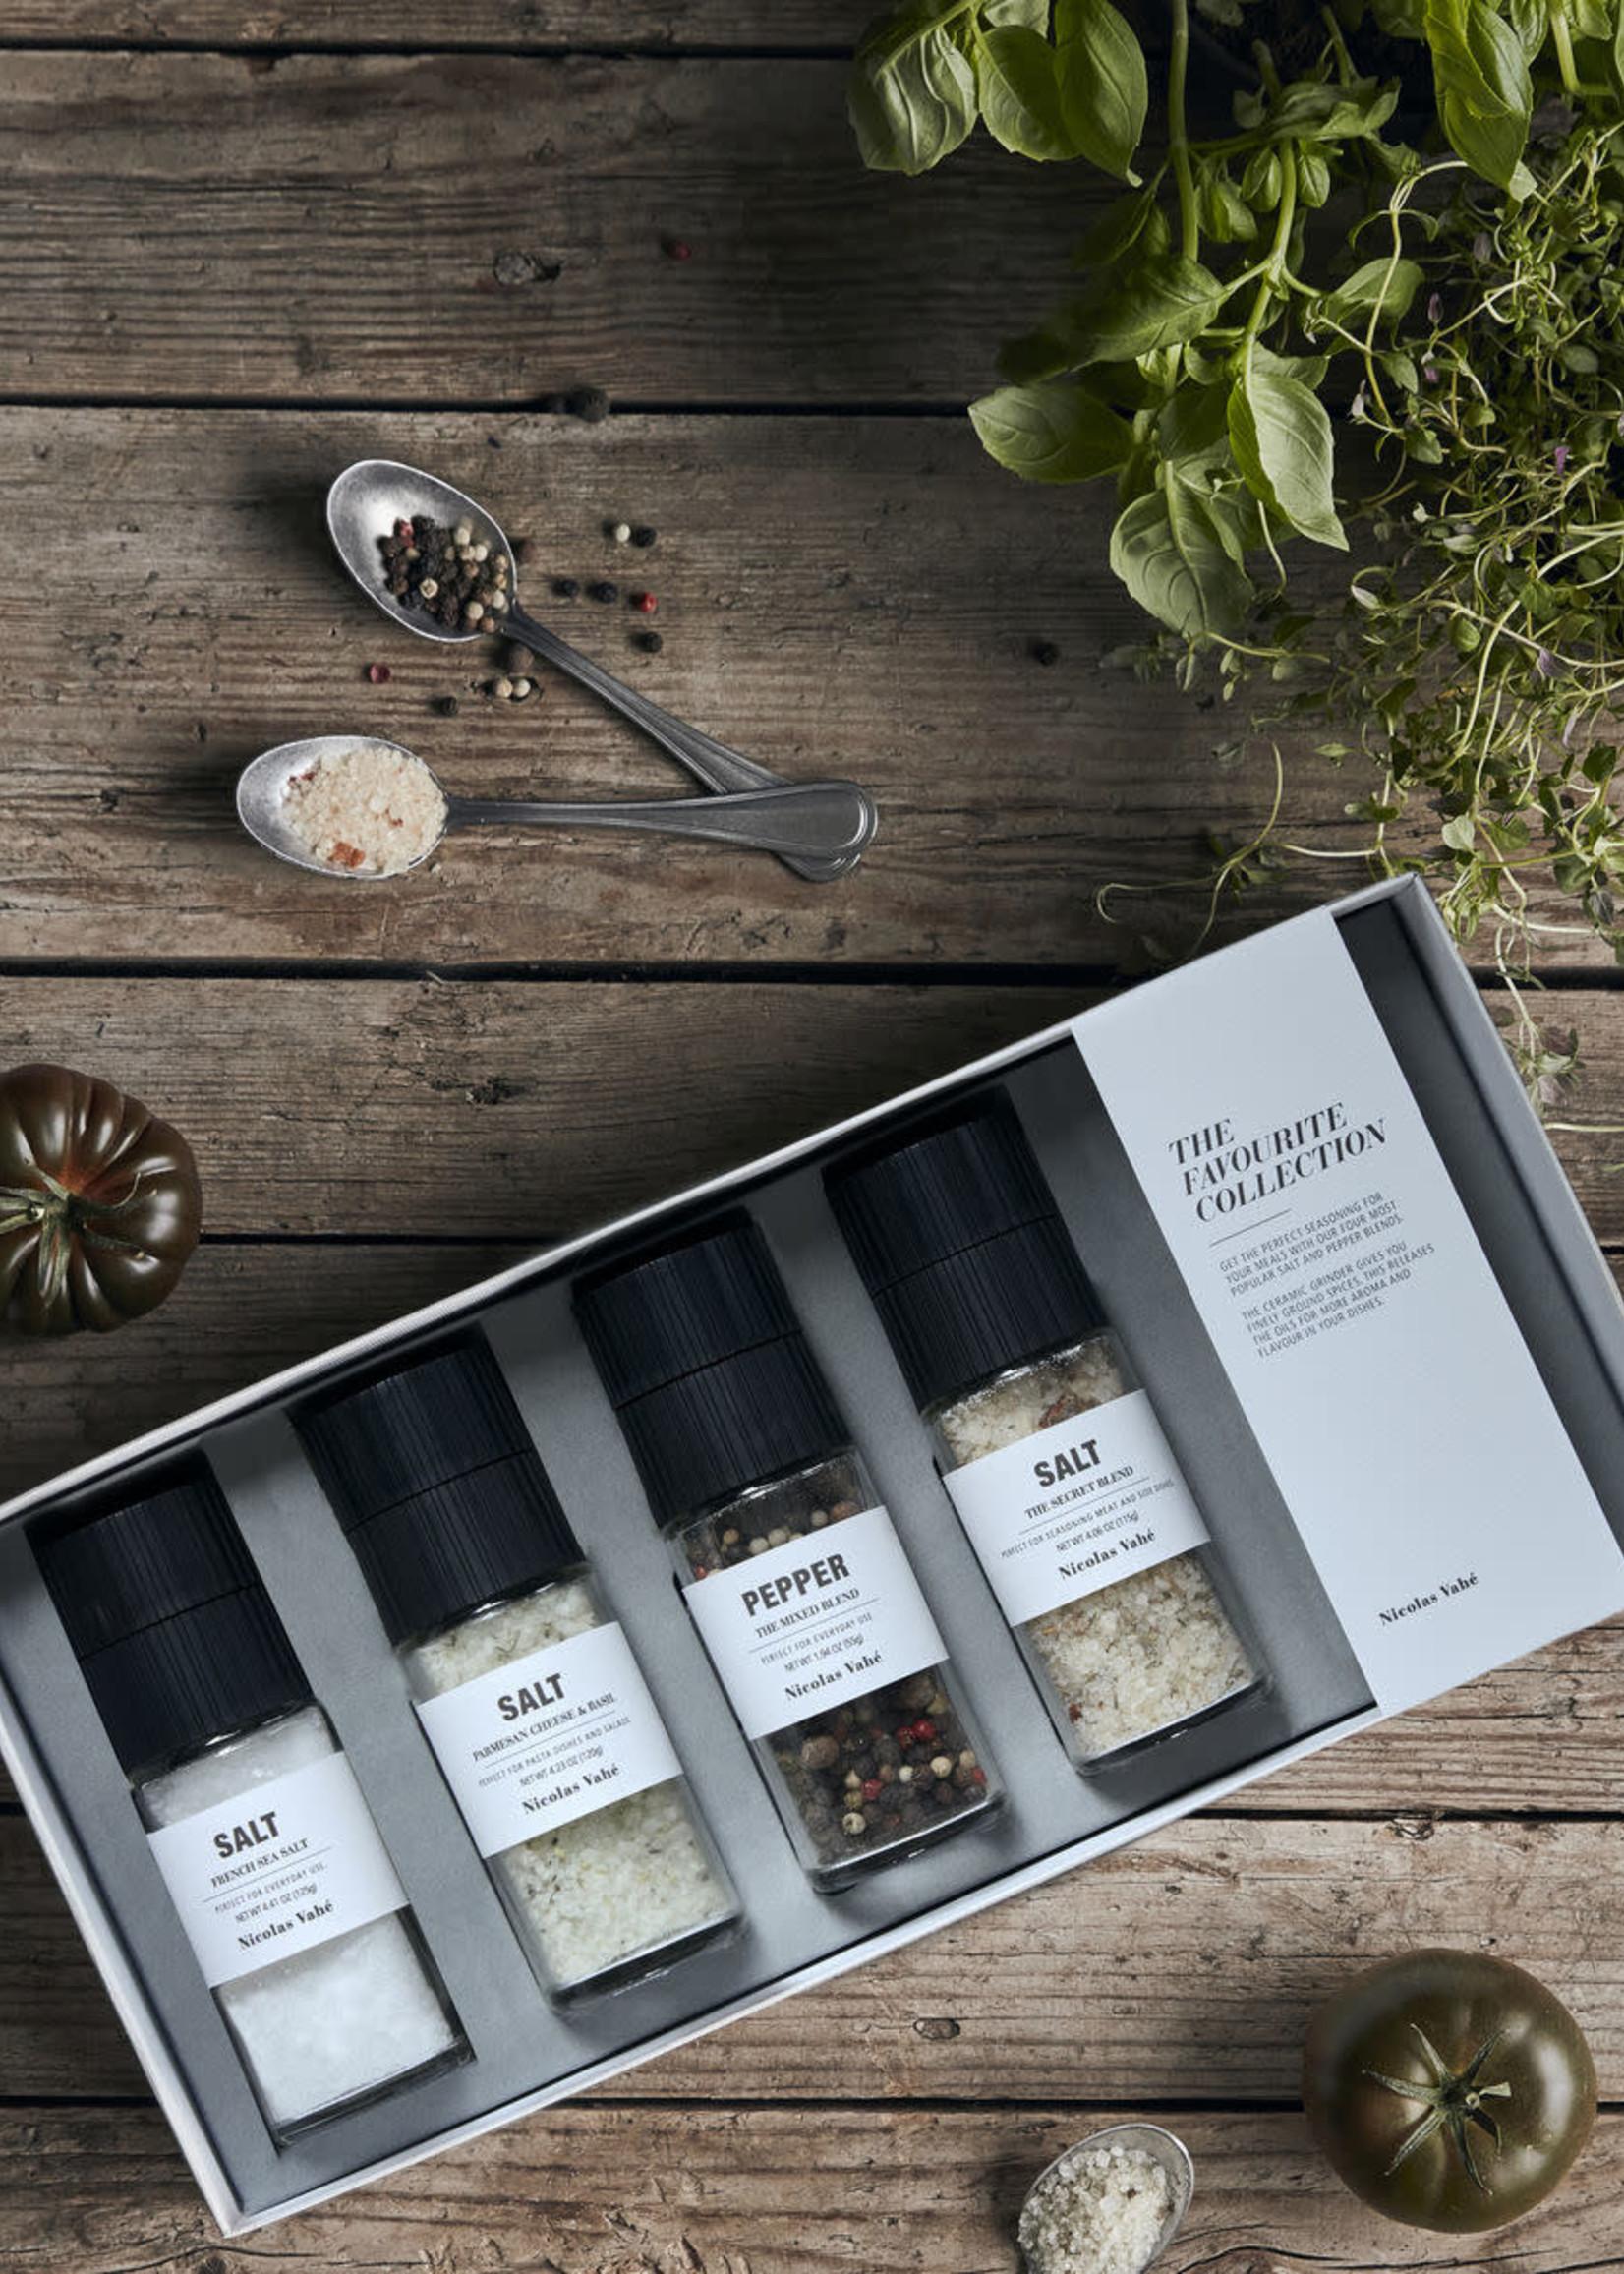 Nicolas Vahé Gift box,  favourite collection